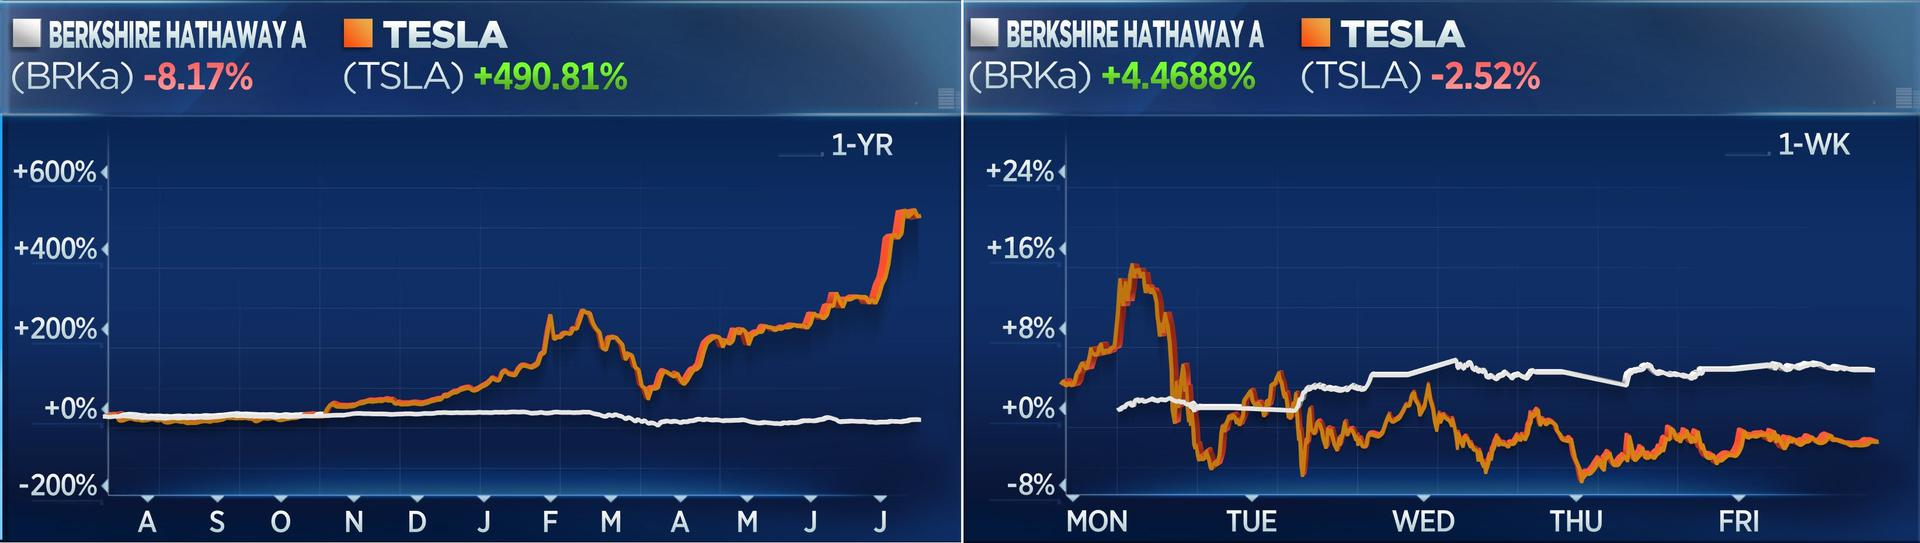 1-year stock chart: Berkshire Hathaway Class A down 8.17%, Tesla up 490.81%